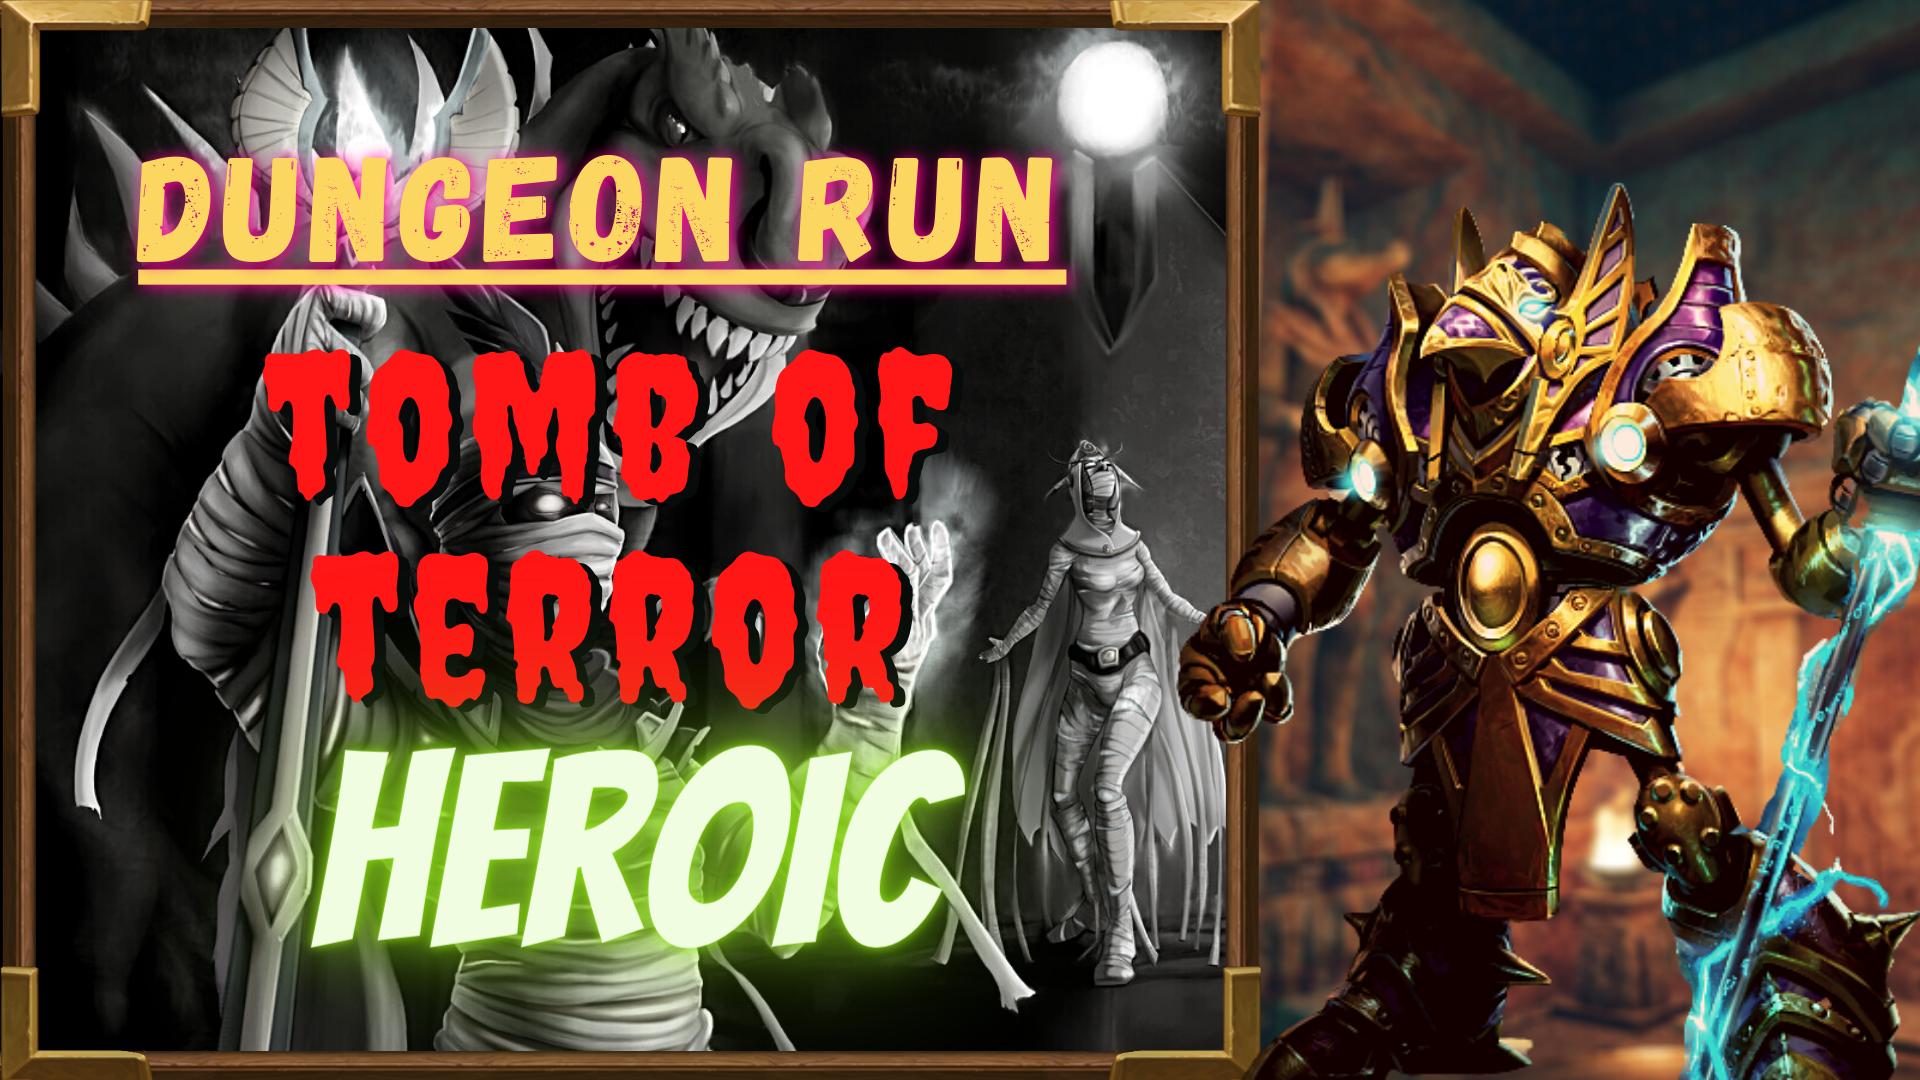 DUNGEON RUN: TOMB OF TERROR - HEROIC GBD - e2p.com